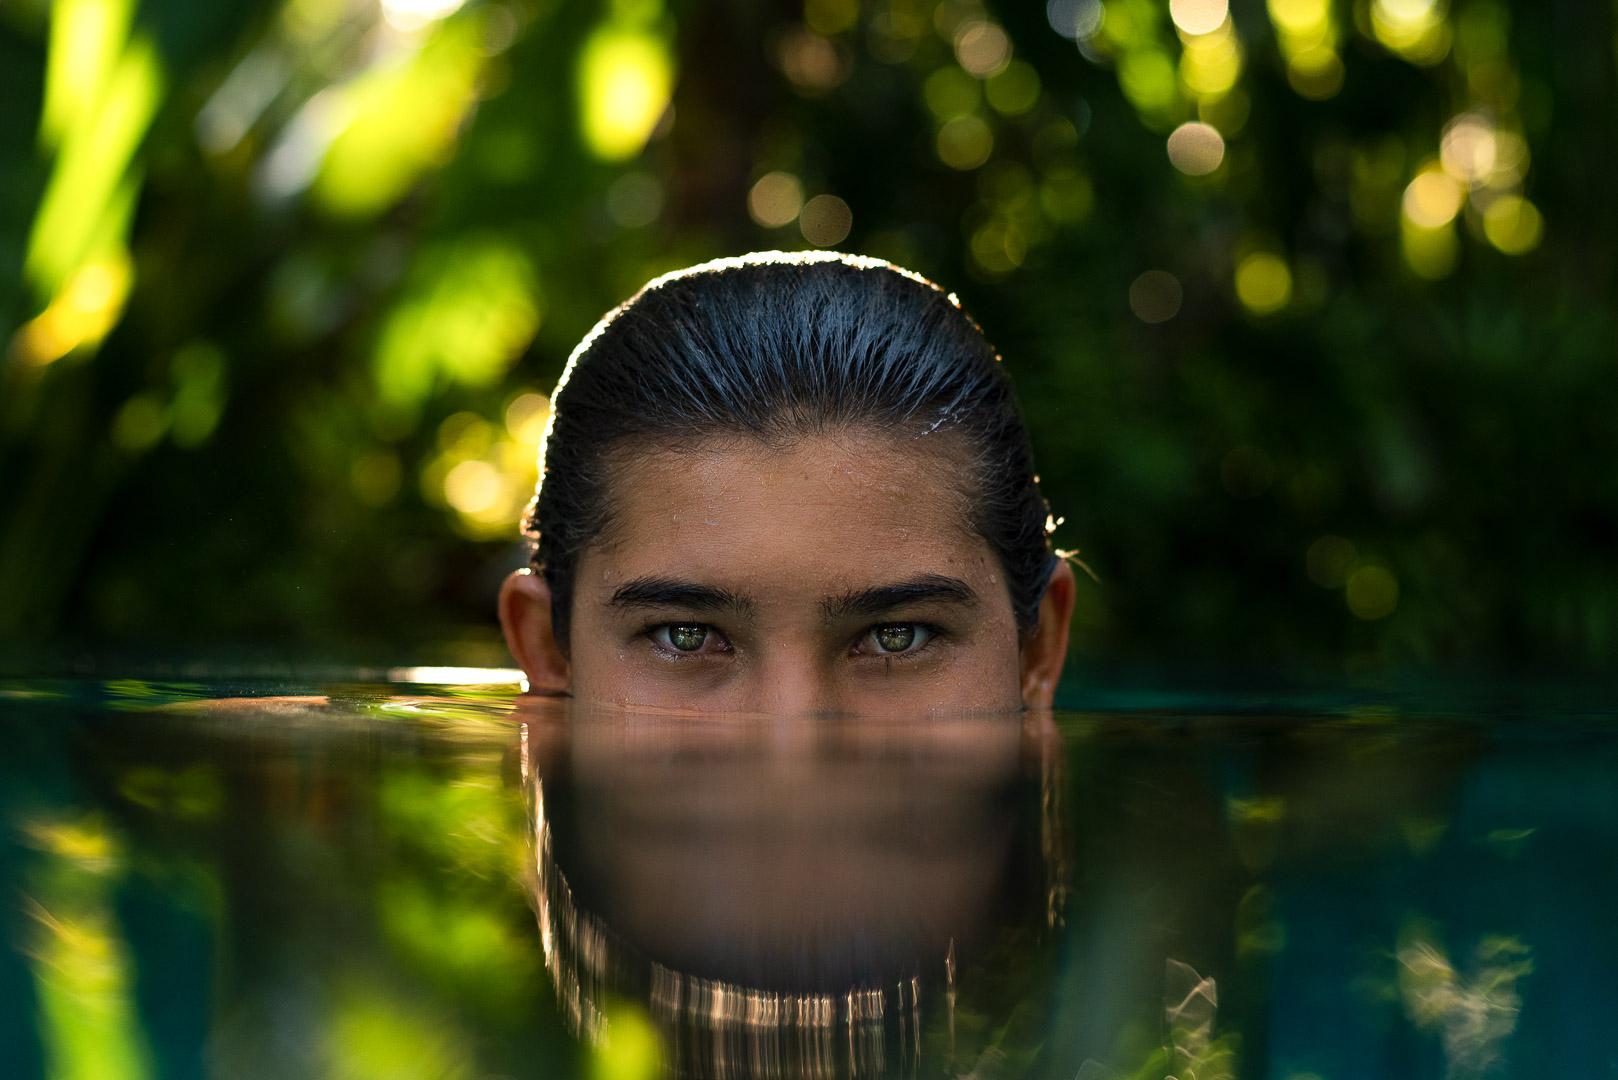 Surf Ocean & Lifestyle Photography workshop in Bali - underwater portraits Brisa Hennessy.jpg